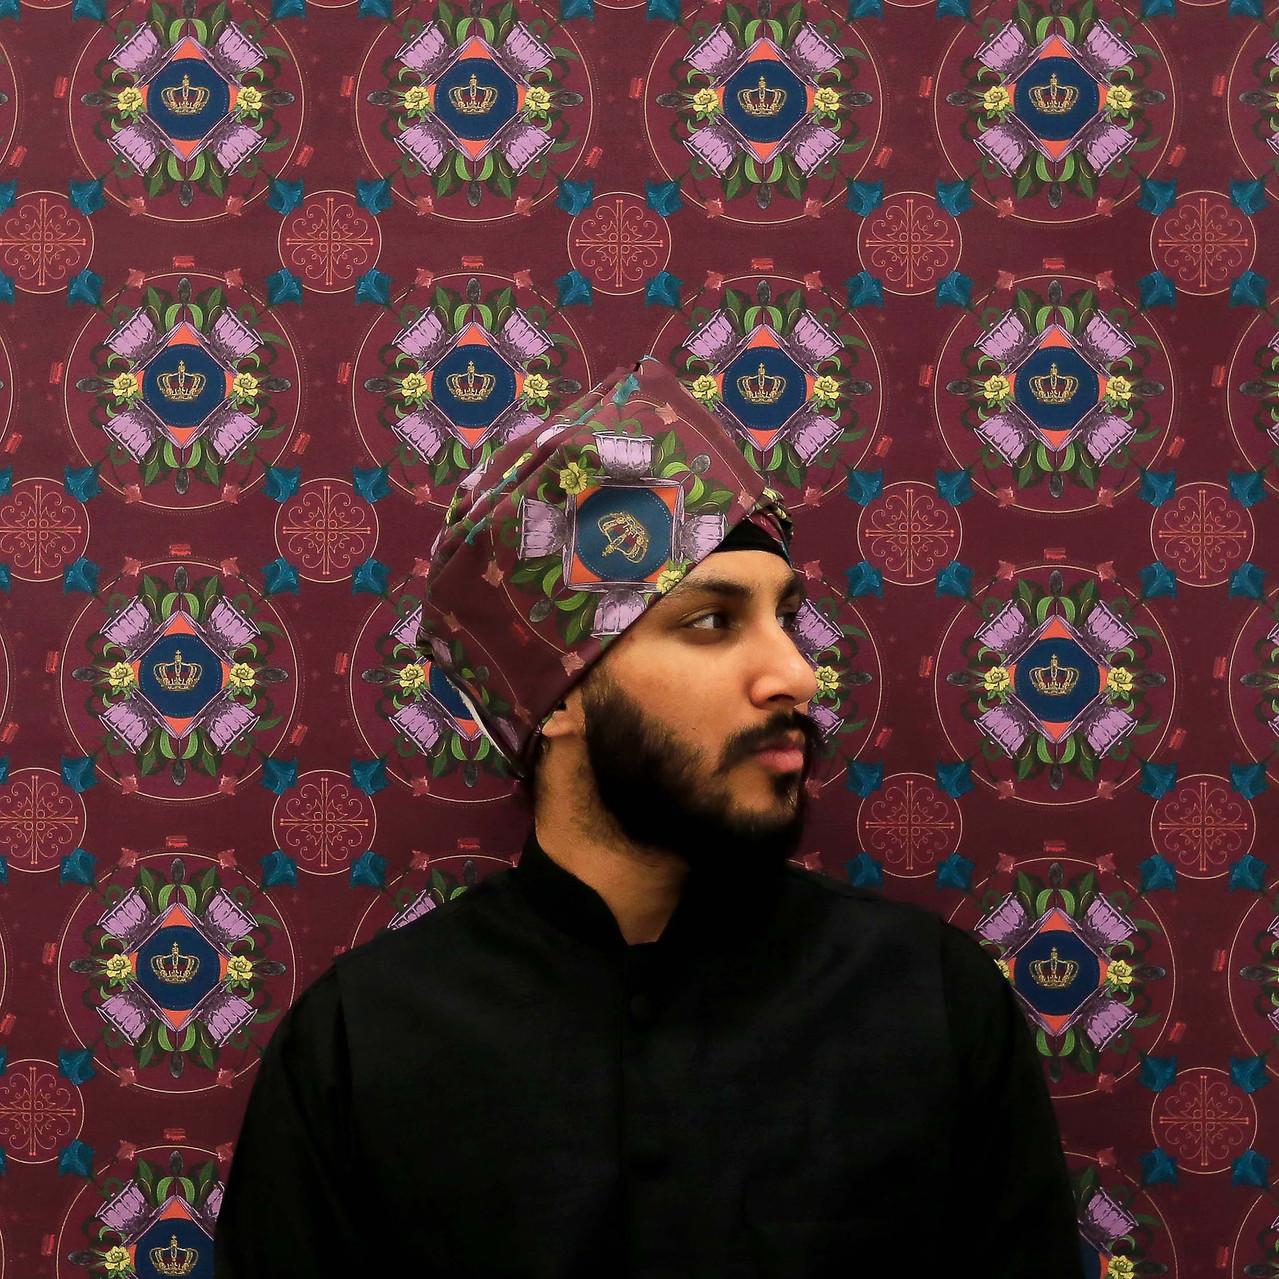 'Interwoven' a pattern and fabric art portrait project by Birmingham artist Farwa Moledina